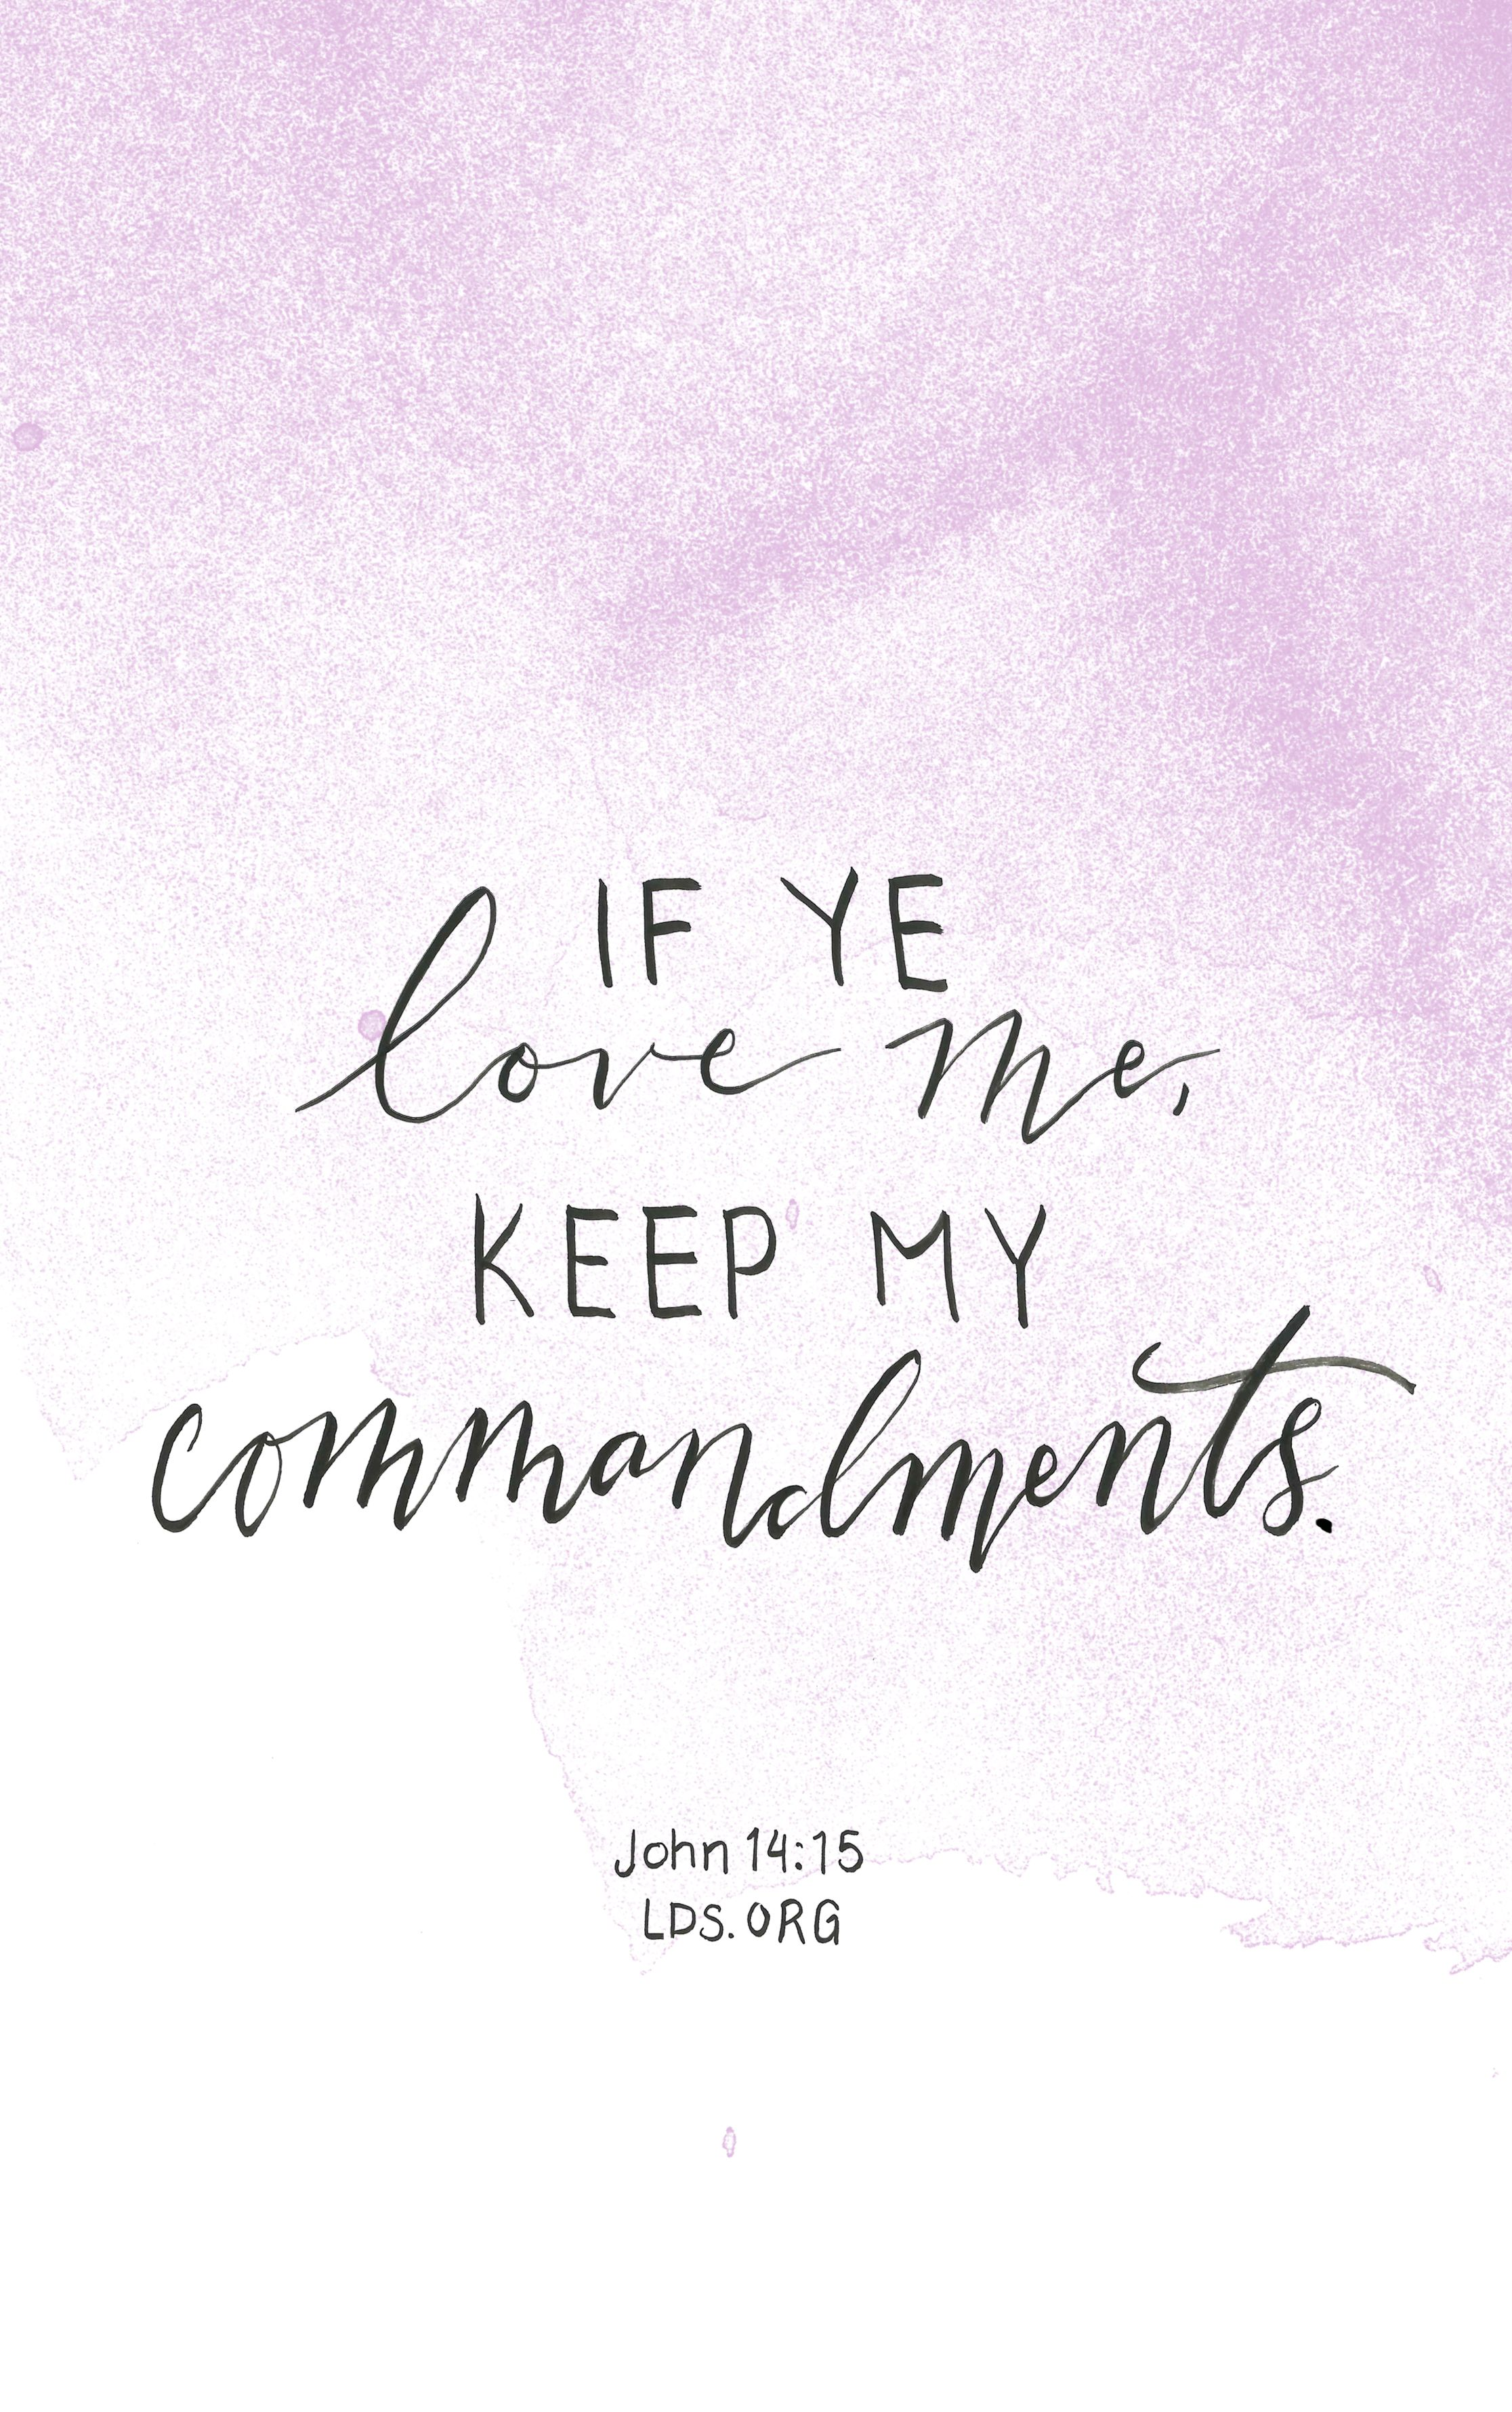 If ye love me, keep my commandments  —John 14:15 #LDS